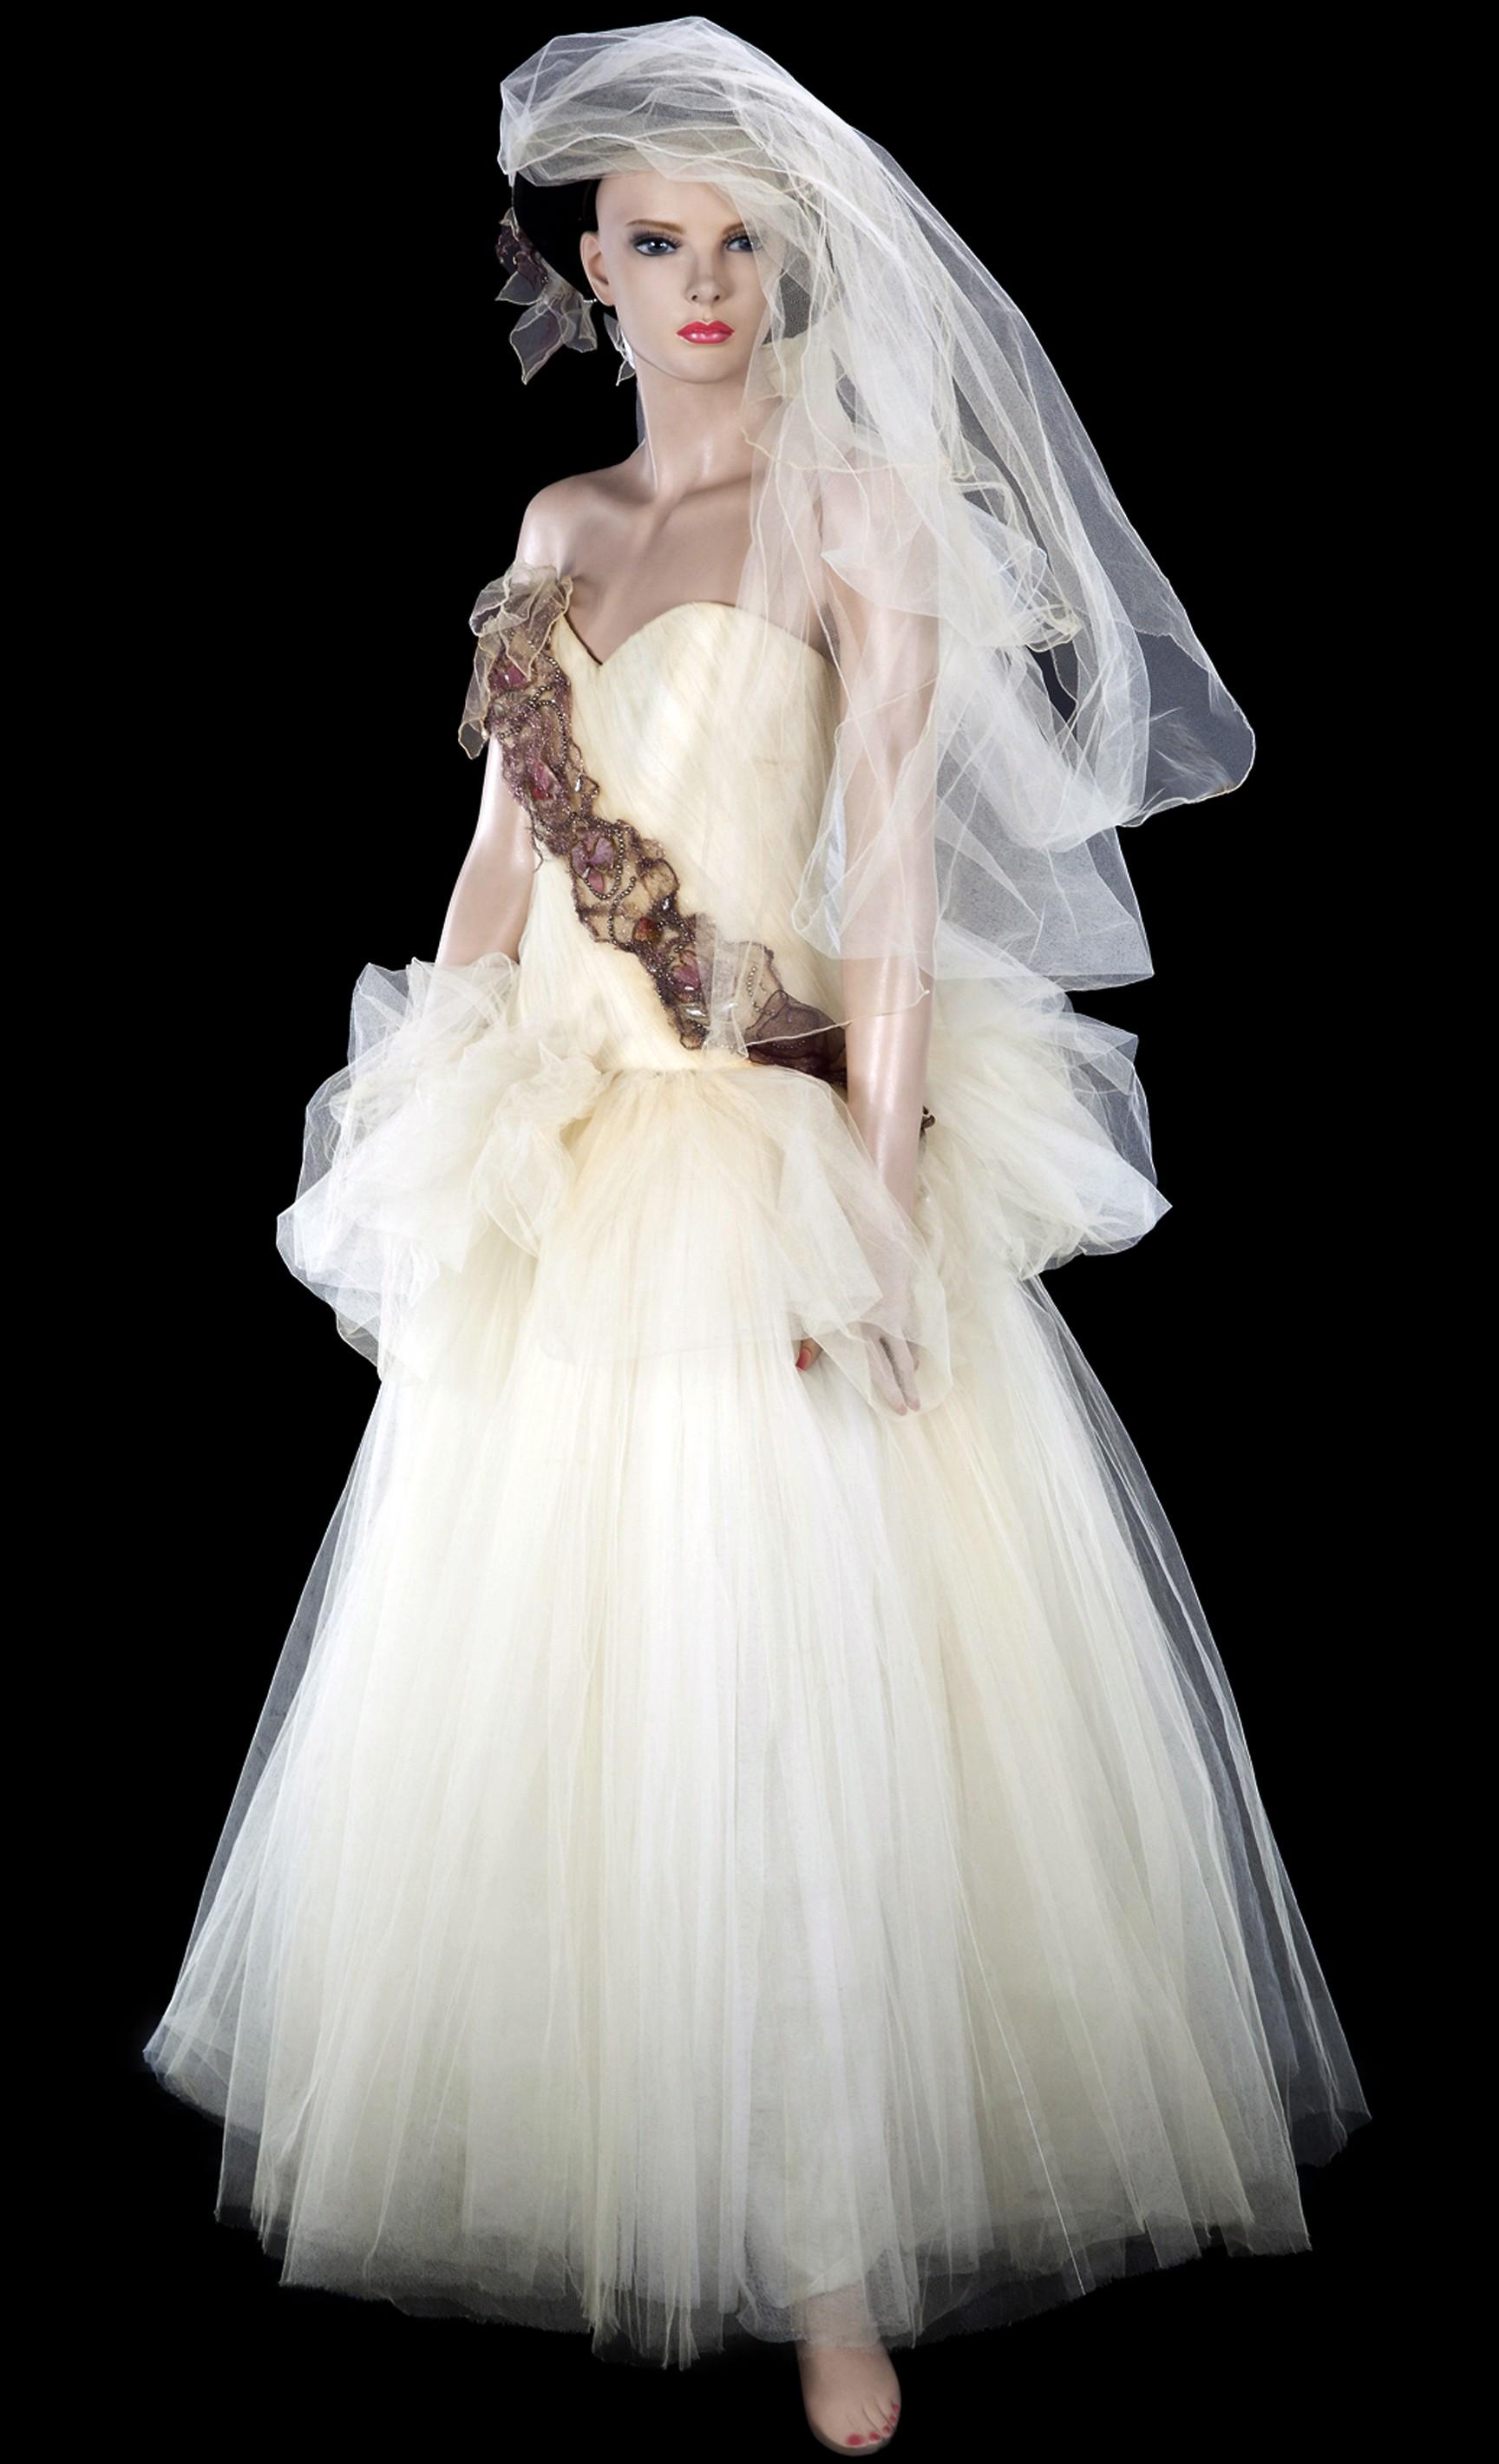 Retour sur la robe de mari e de madonna vendue 81 250 for Quand les robes de mariage seront elles en vente